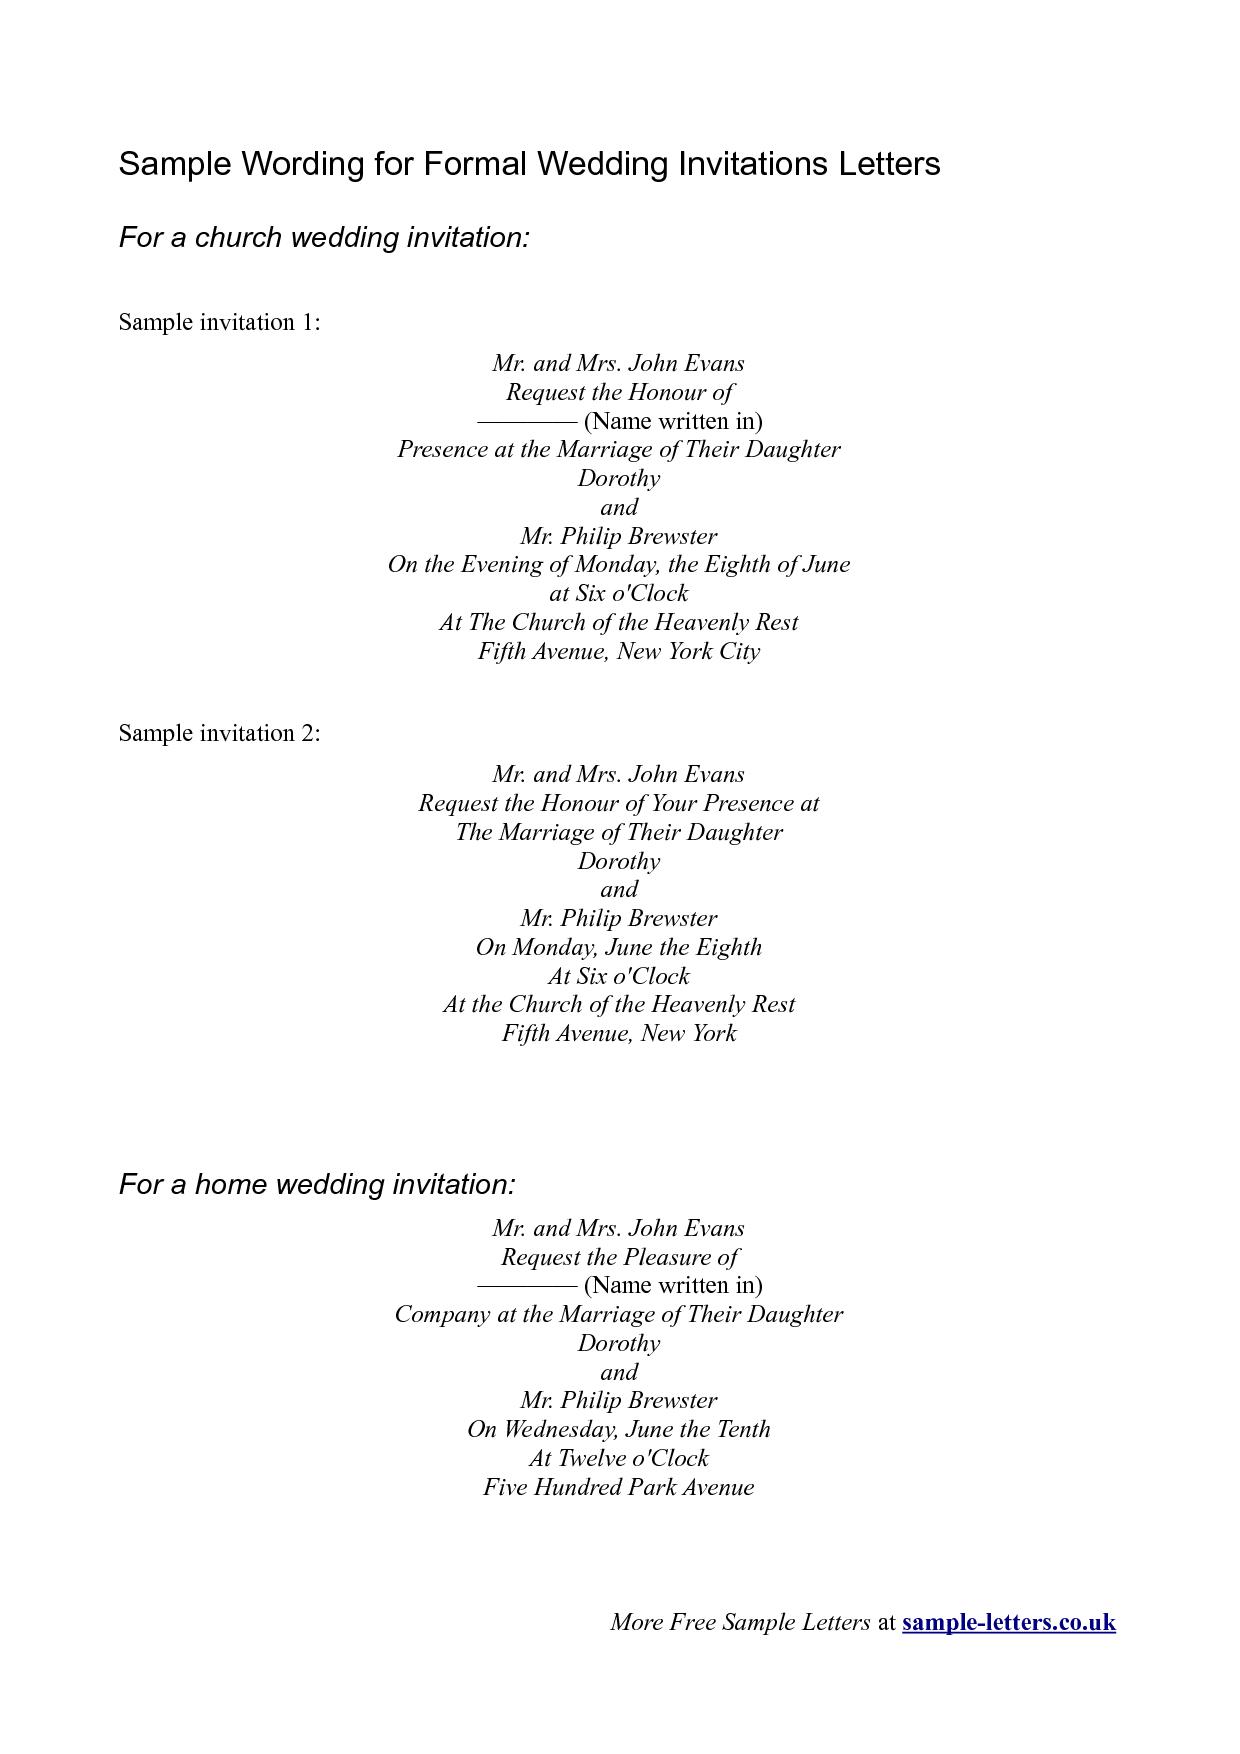 Invitation sample sample wording for formal wedding invitations charity golf day invitation letter event best ideas mbm best free home design idea inspiration stopboris Images